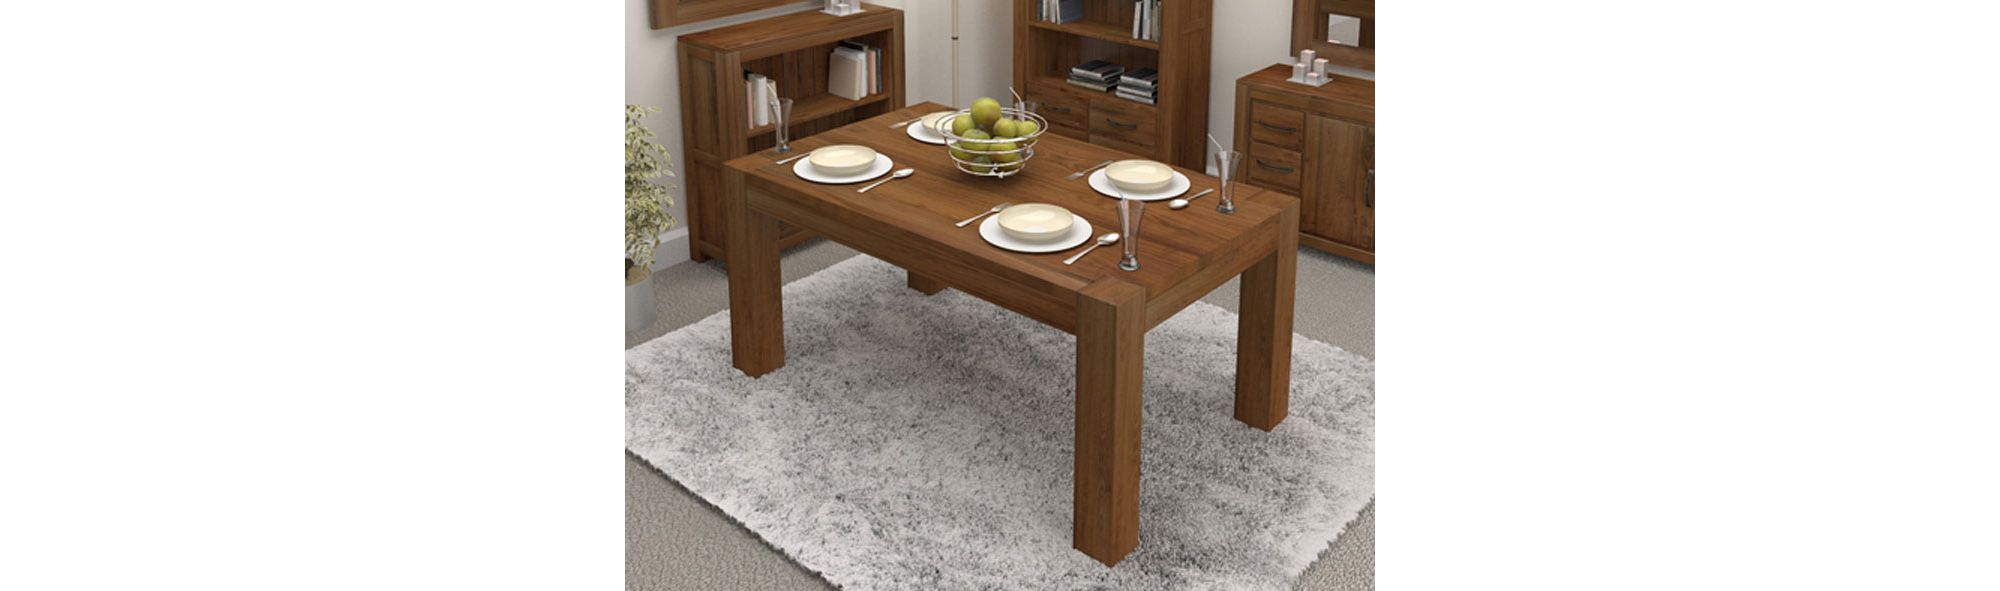 Extending Table 187 Walnut Extending Tables : 684 7091PI1000190MNwid2000amphei2000 from extendingtable.co.uk size 2000 x 2000 jpeg 107kB